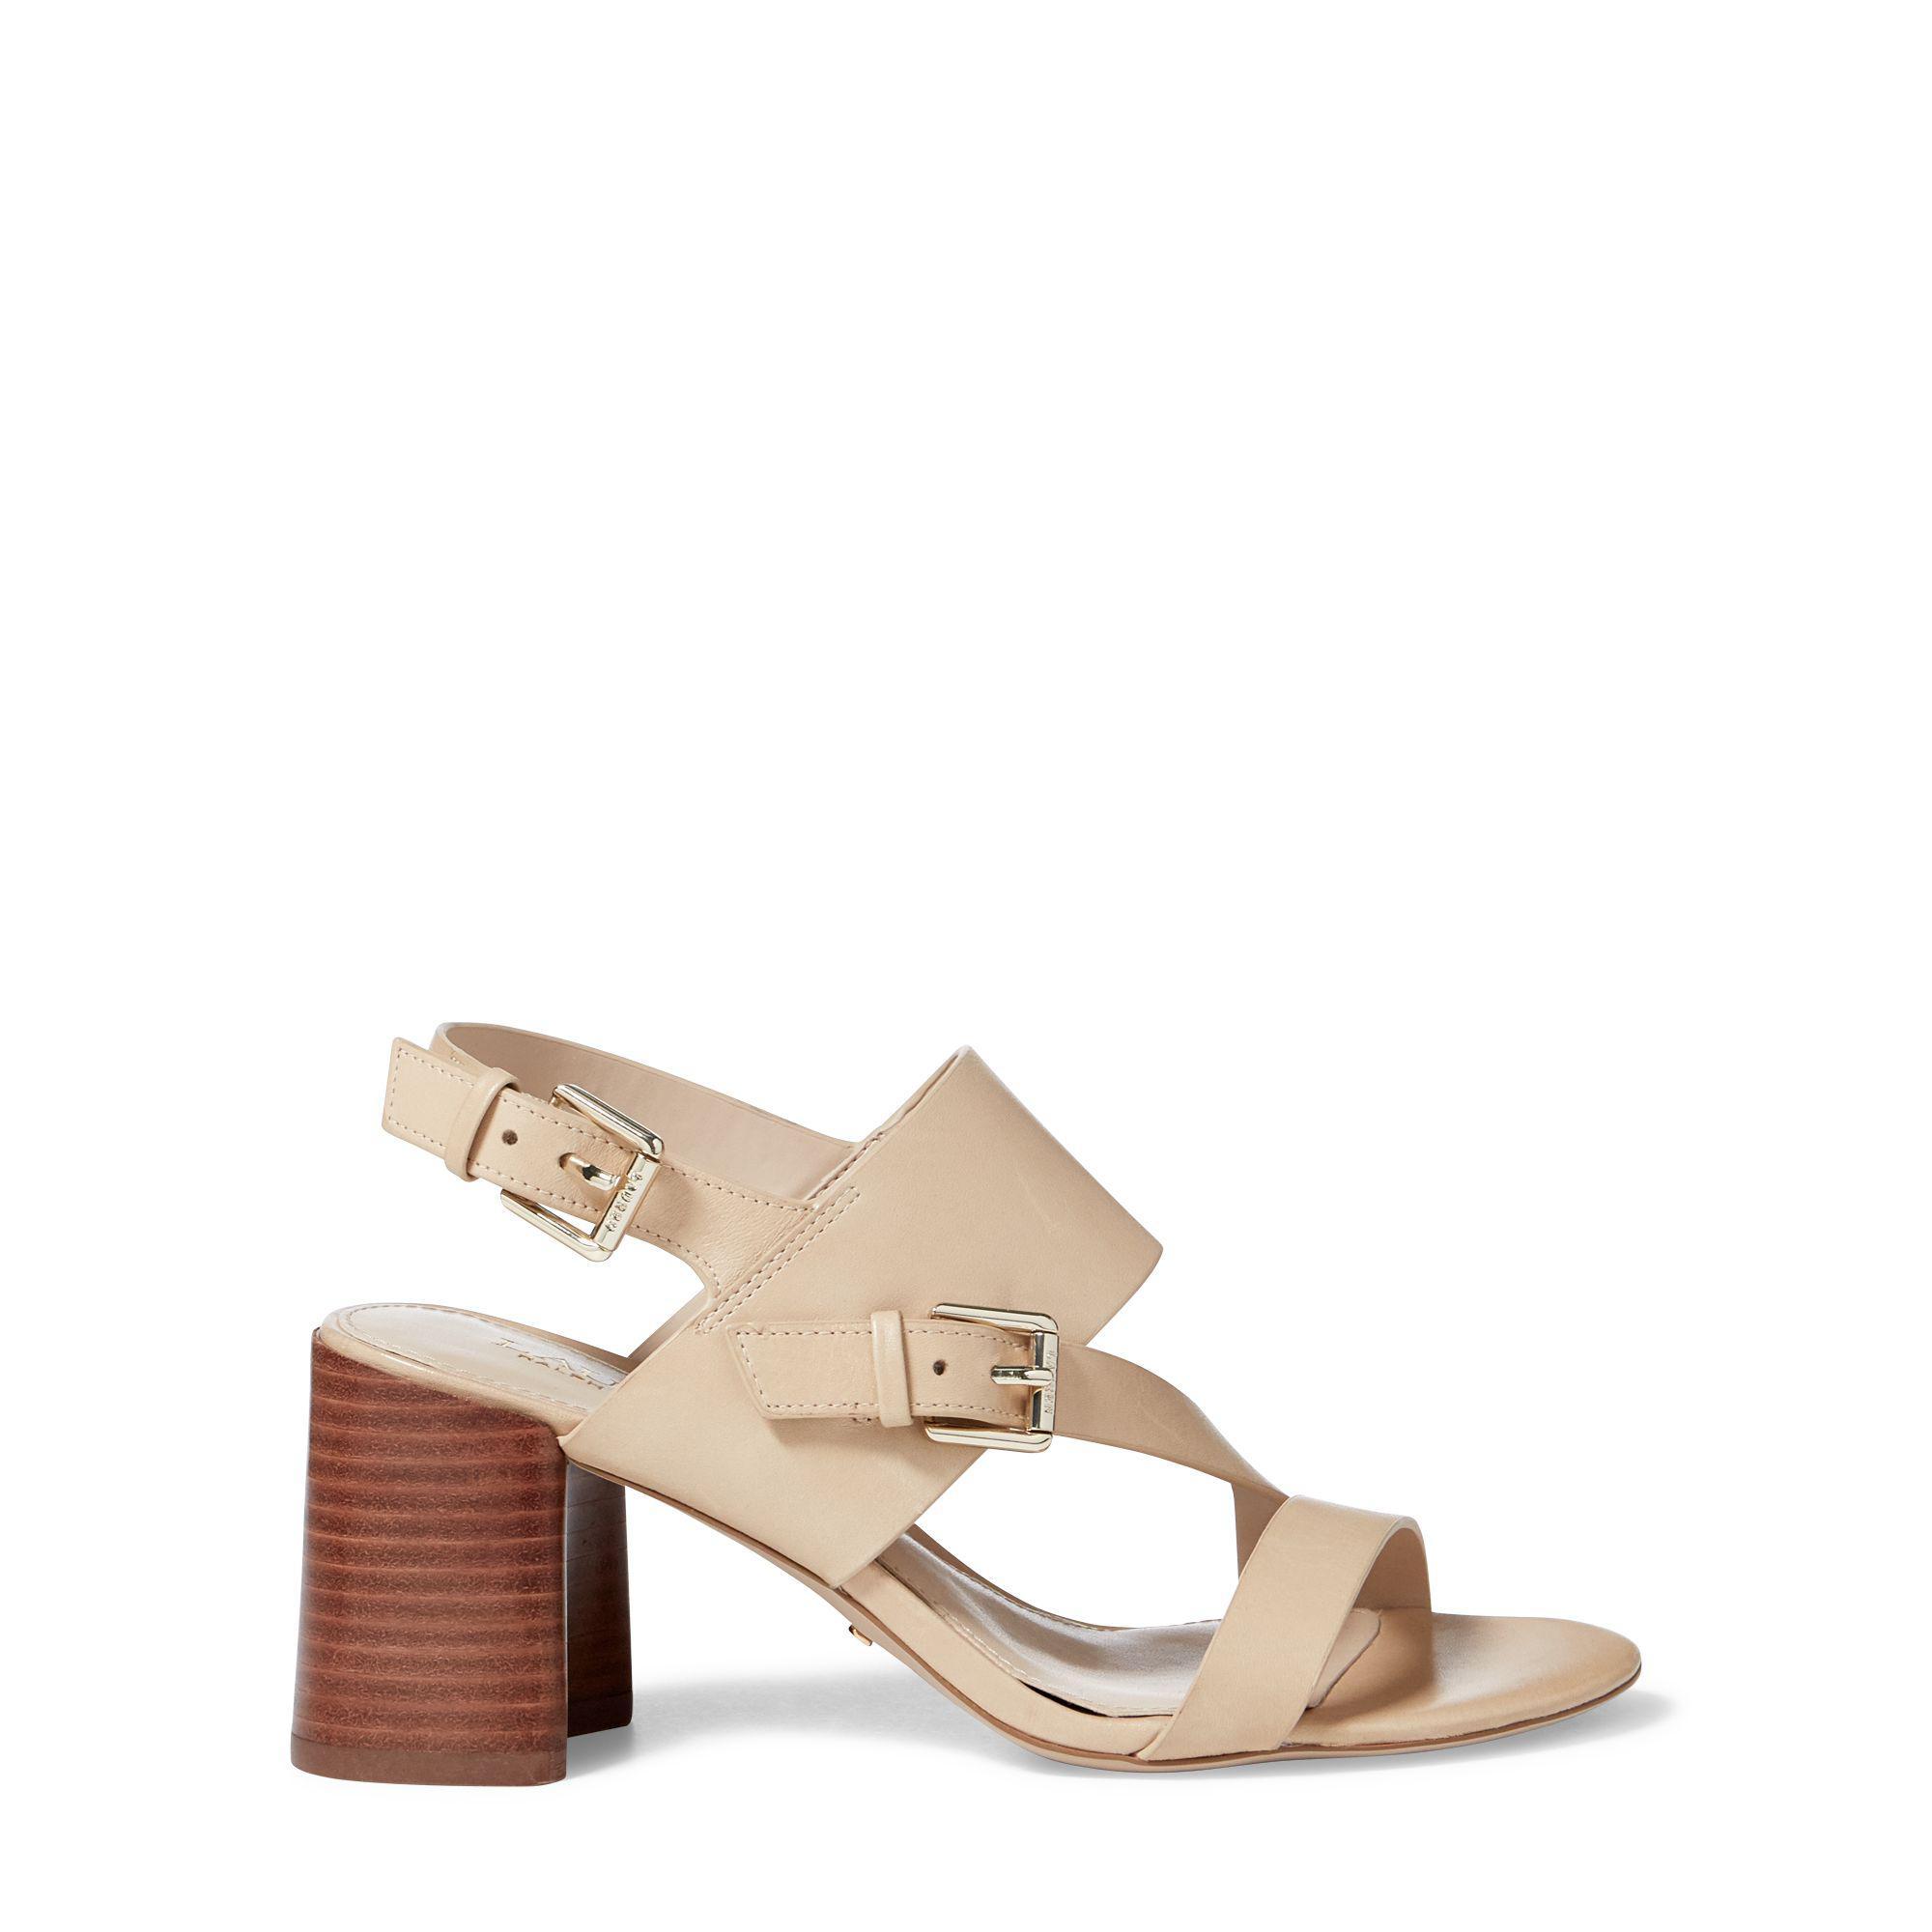 6b2bc7c8478 Ralph Lauren Multicolor Florin Vachetta Leather Sandal